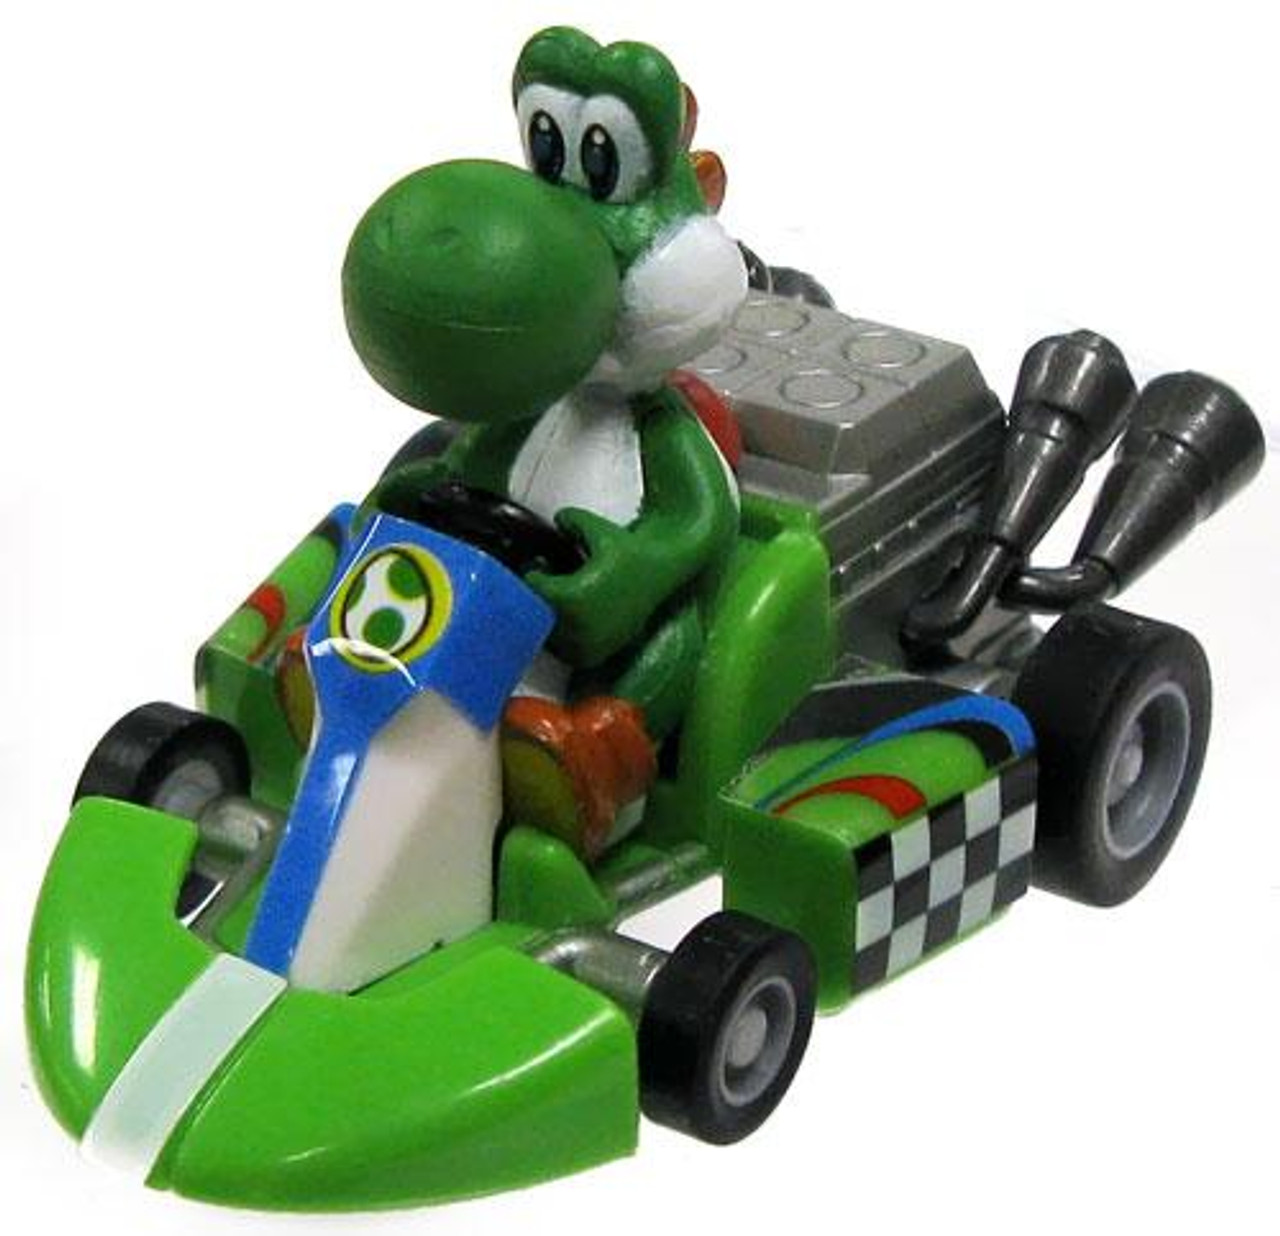 Super Mario Mario Kart Gacha Yoshi 1.5-Inch Pull Back Racer